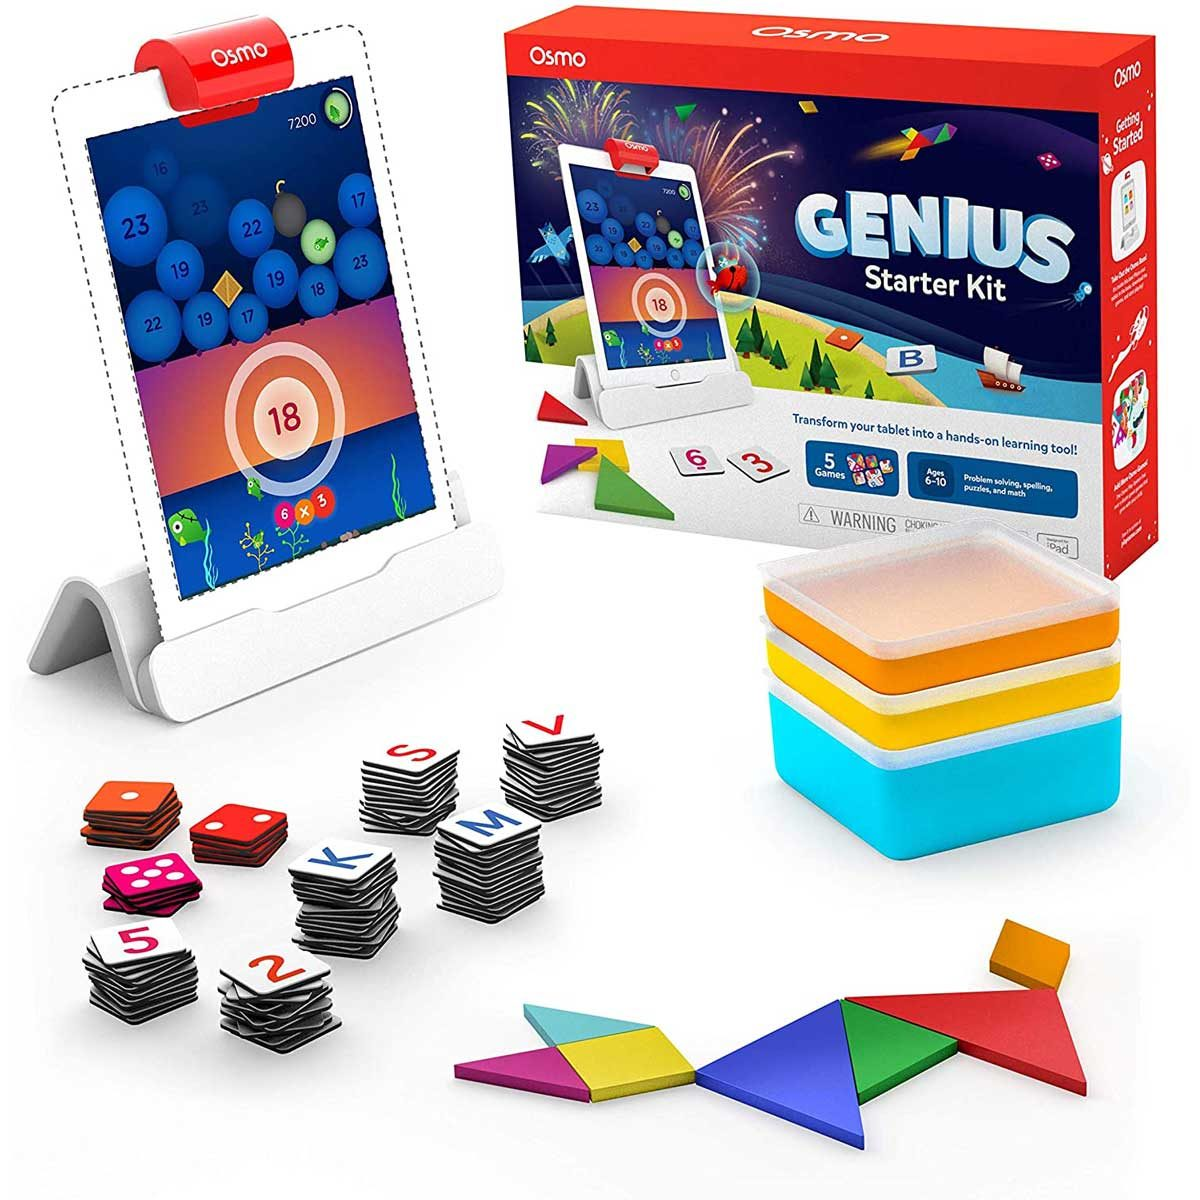 Smart kids game